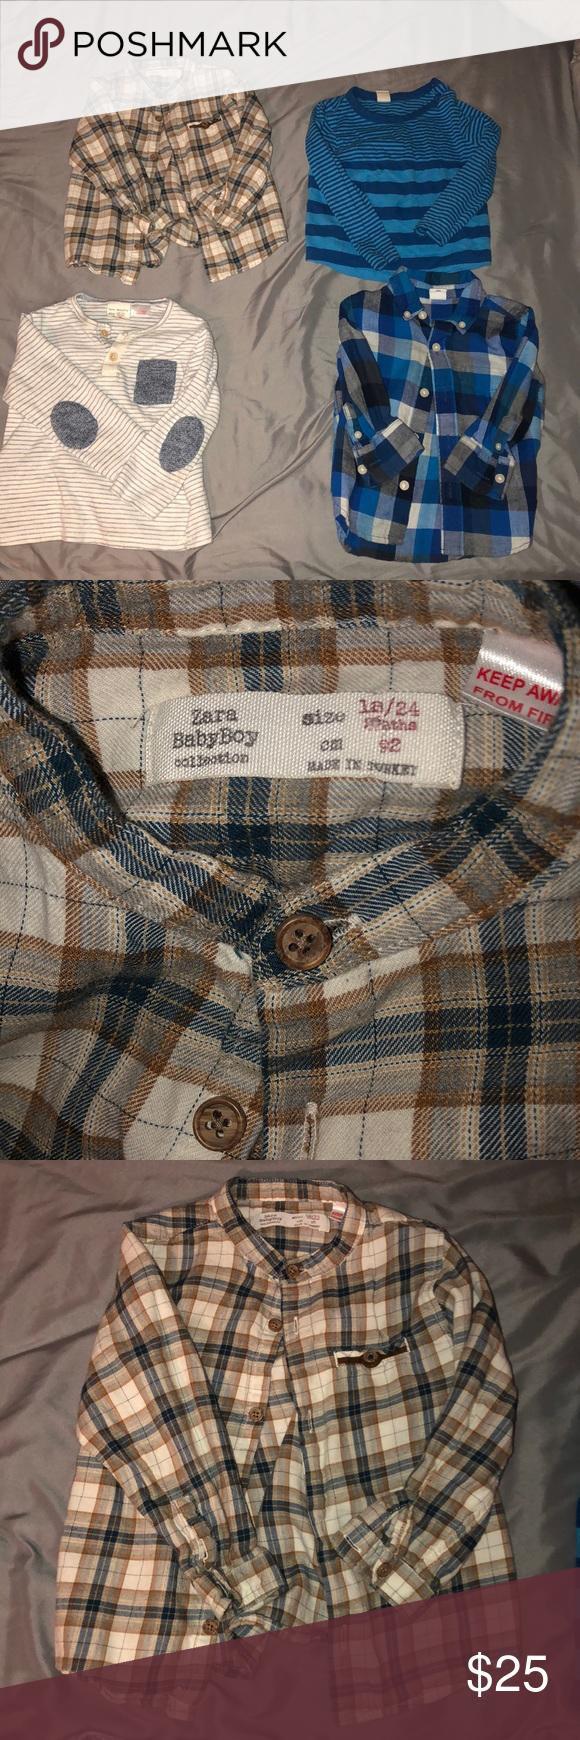 4fa3380ef Boys Shirt Bundle Great Condition. 1. Top left- Zara Baby 18-24 months 2.  Bottom Left- Zara Baby 18-24 months 3. Top right- Tucker Tate 24 months 4.